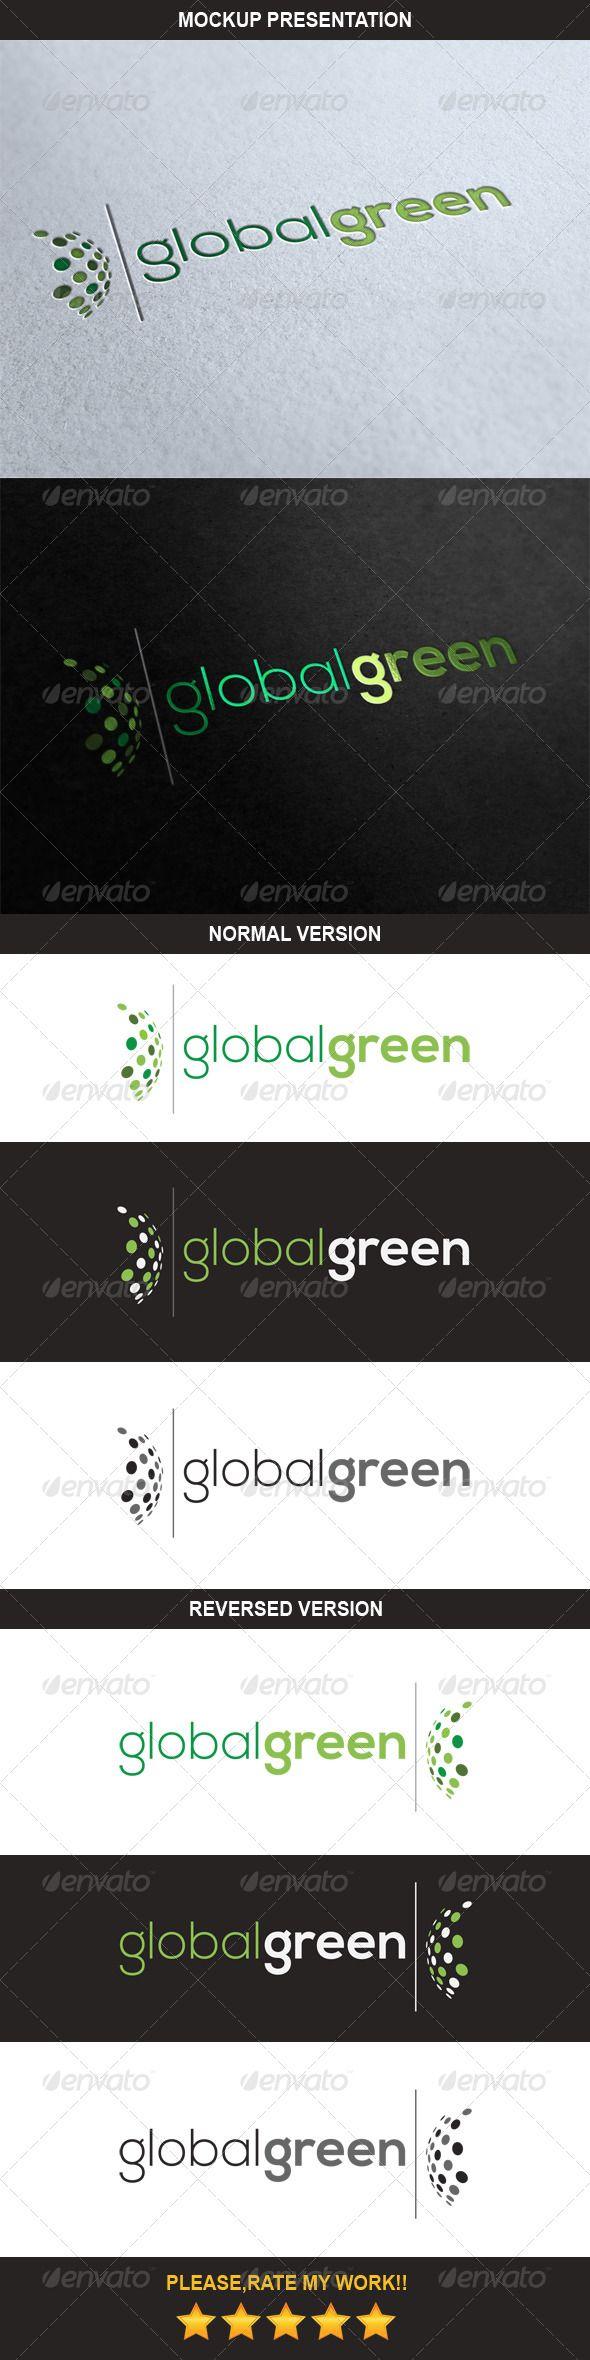 Global Green Logo  EPS Template • Download ➝ https://graphicriver.net/item/global-green-logo/6987340?ref=pxcr